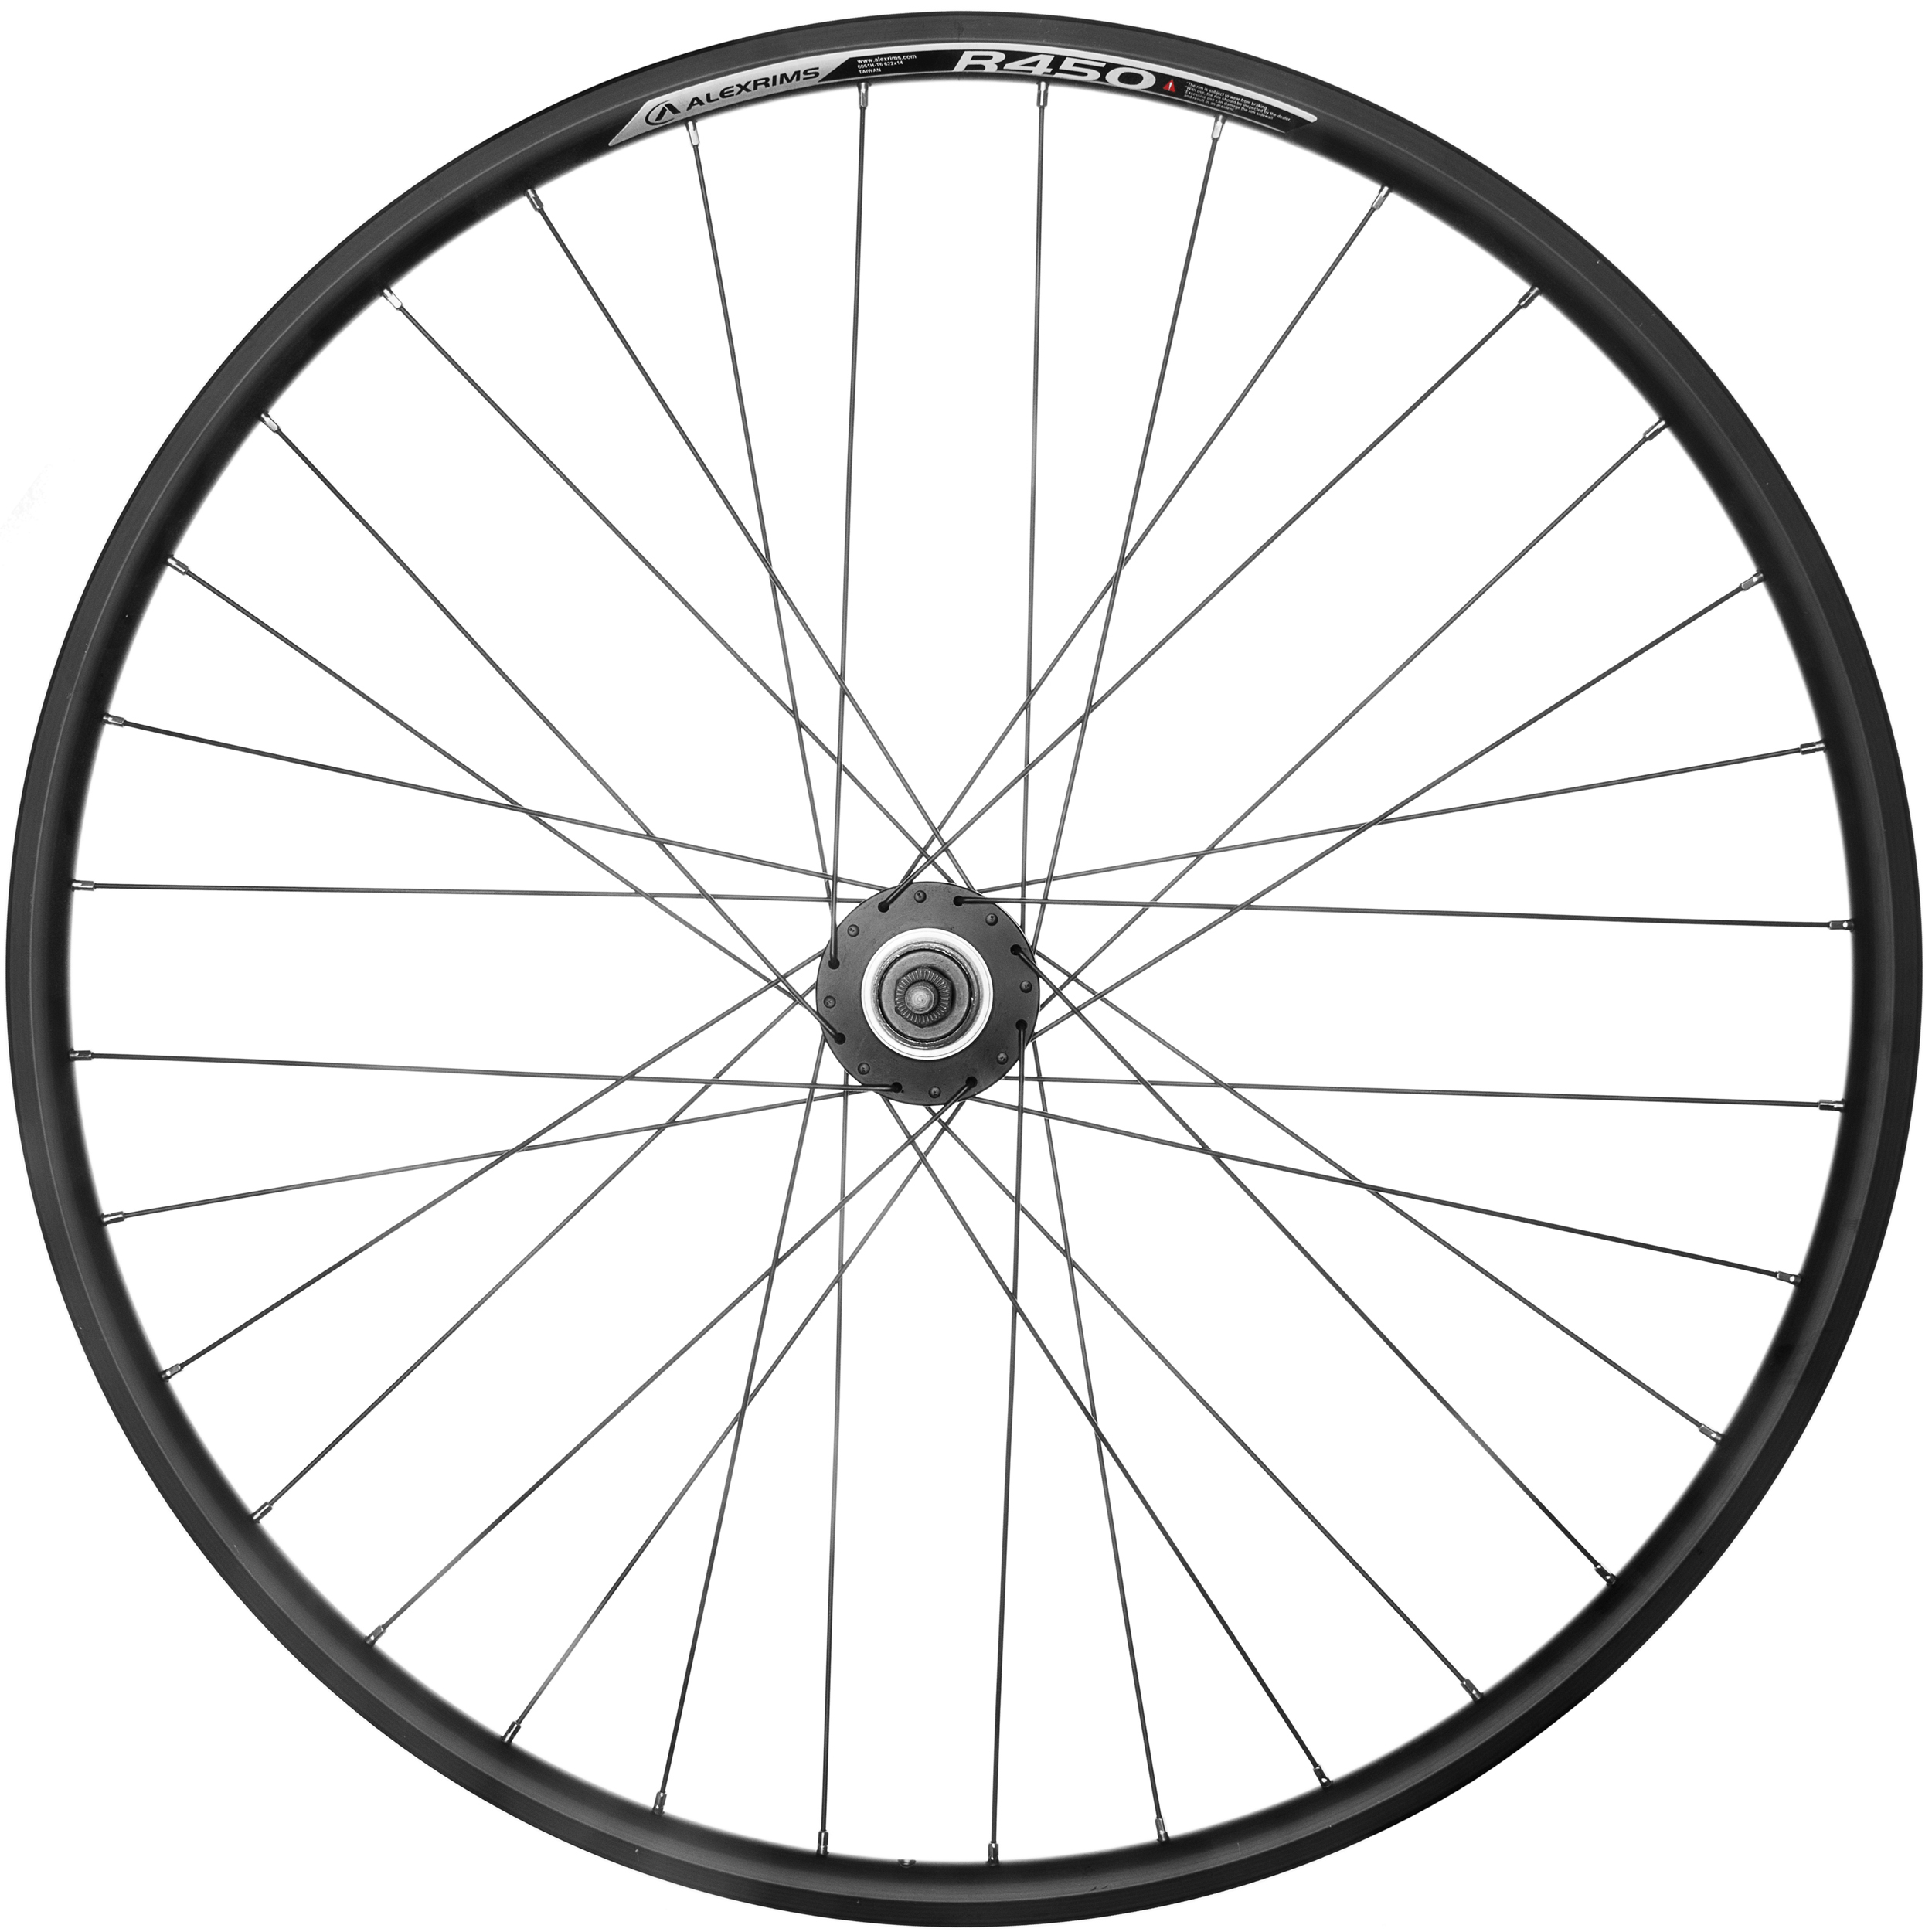 Alex R450 700C 32H 14T Rear Wheel   MEC